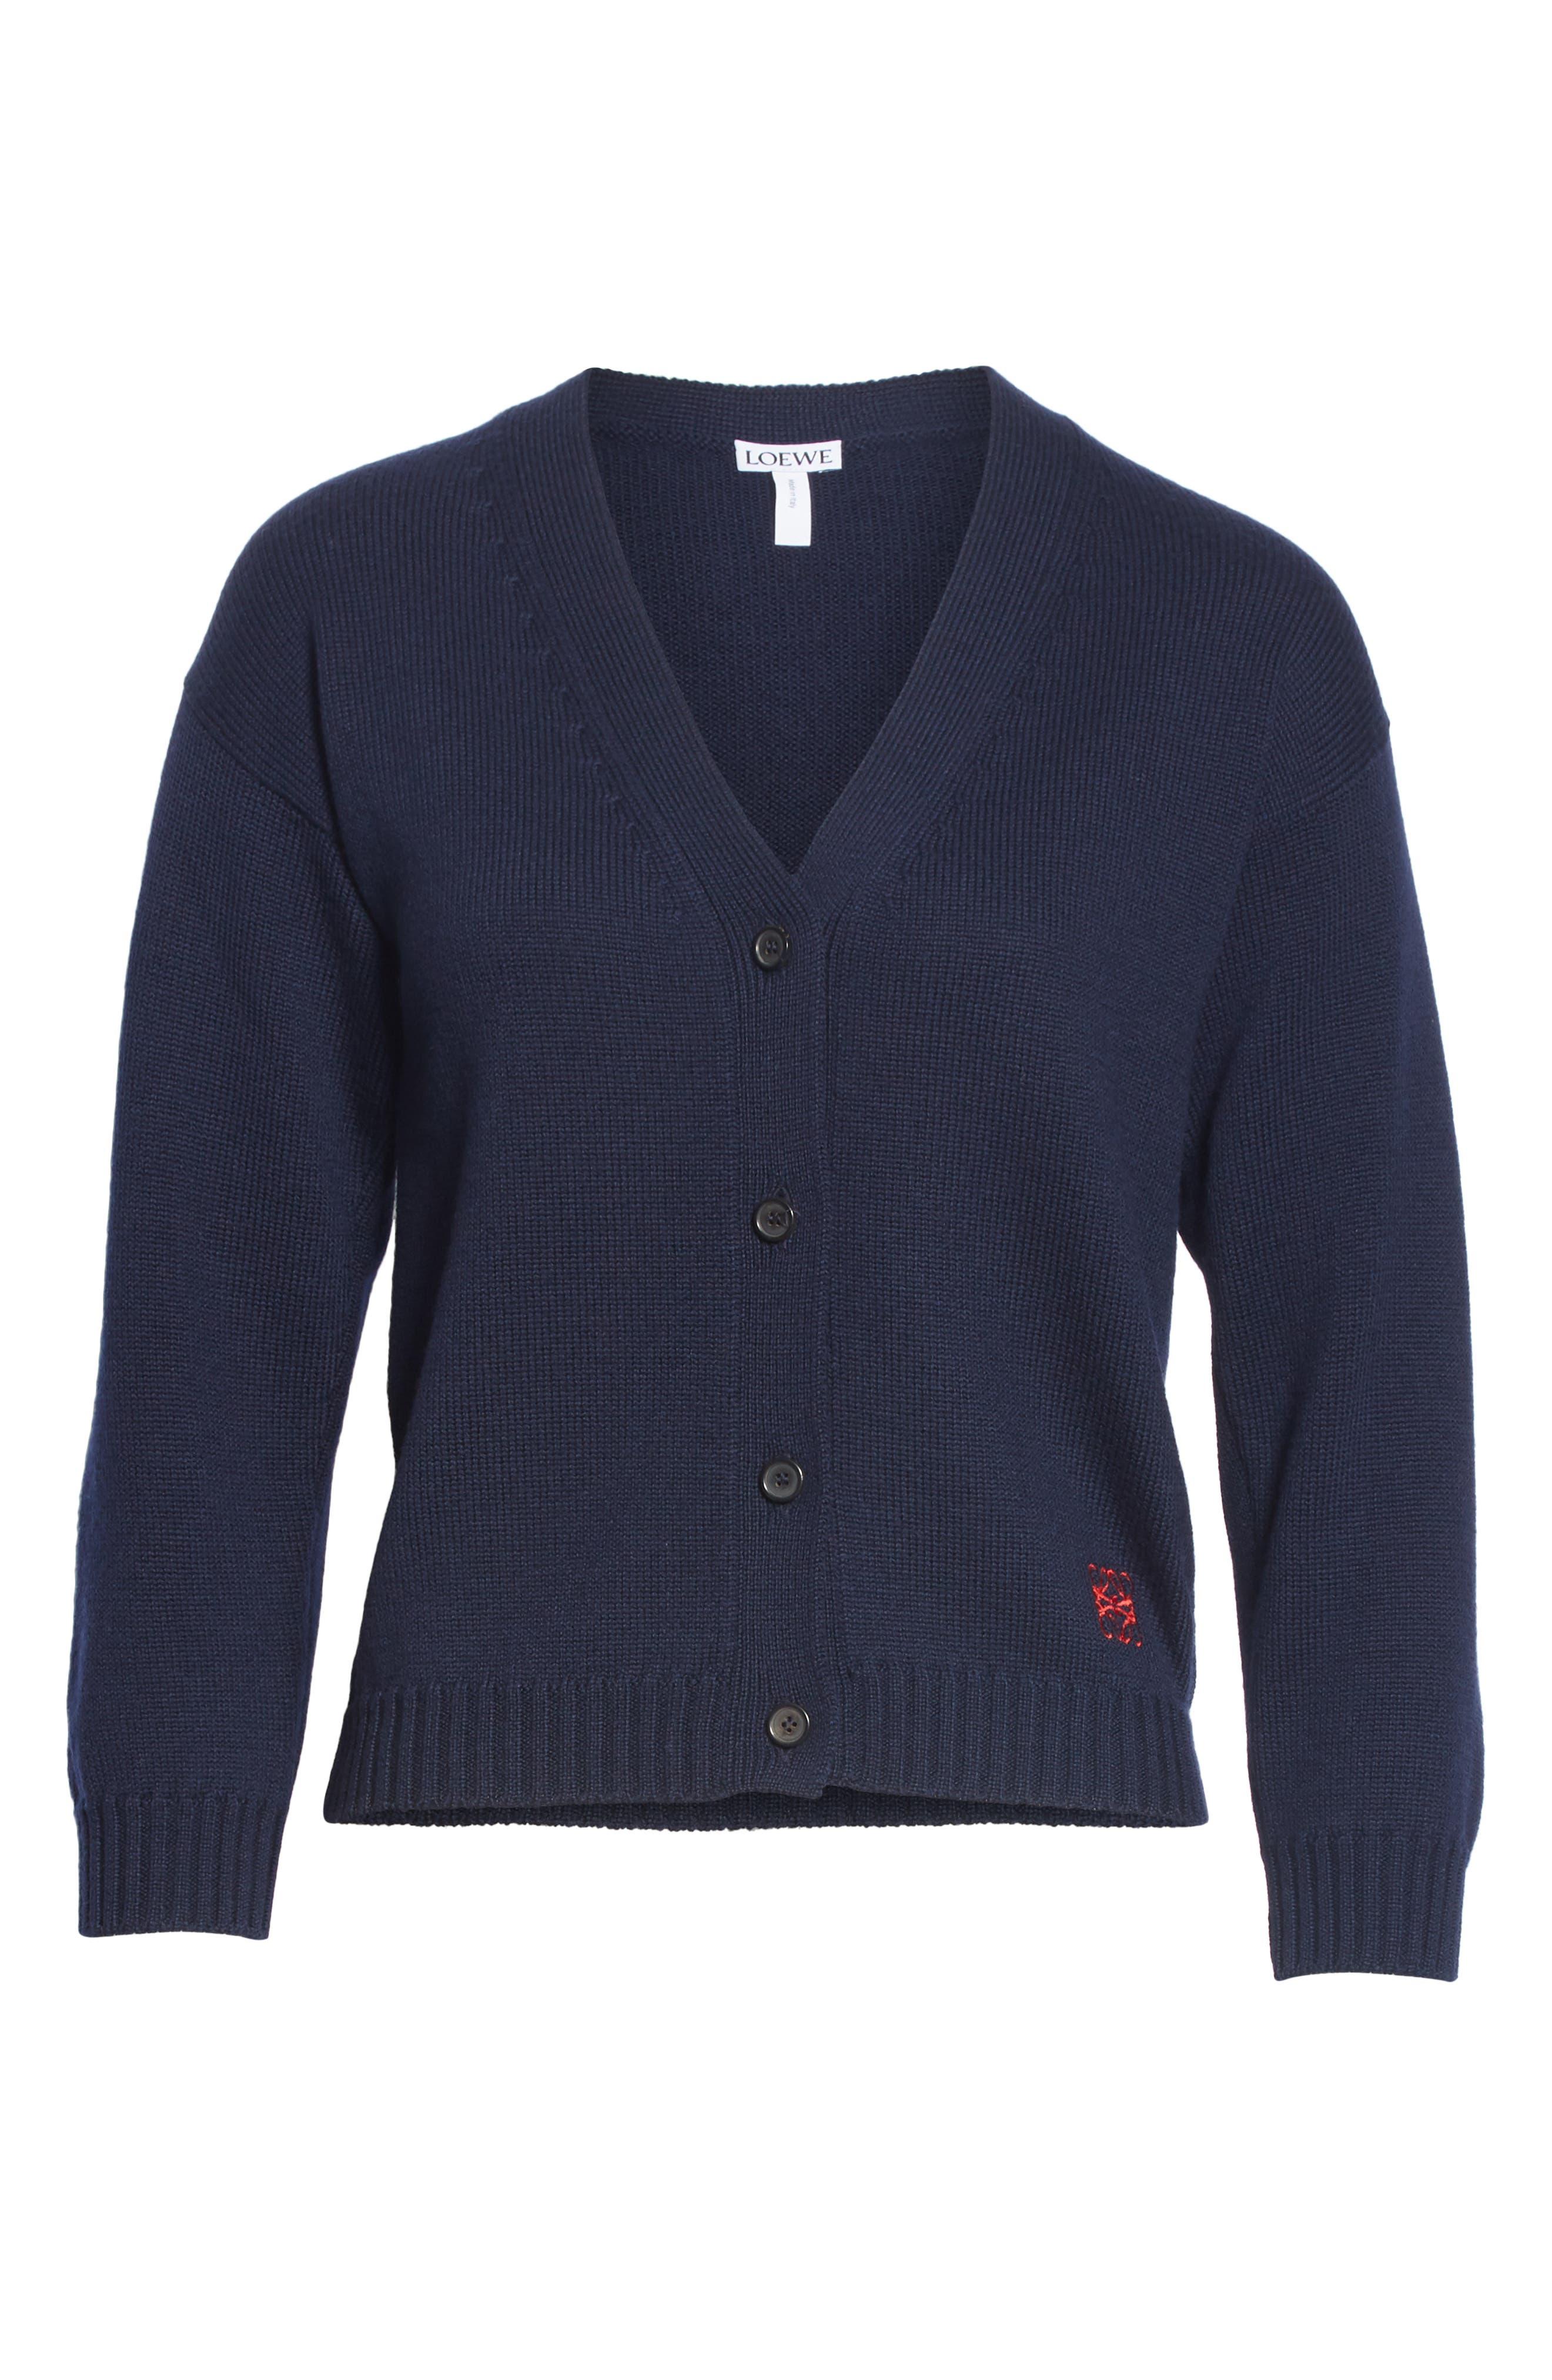 Wool Logo Cardigan,                             Alternate thumbnail 6, color,                             NAVY BLUE